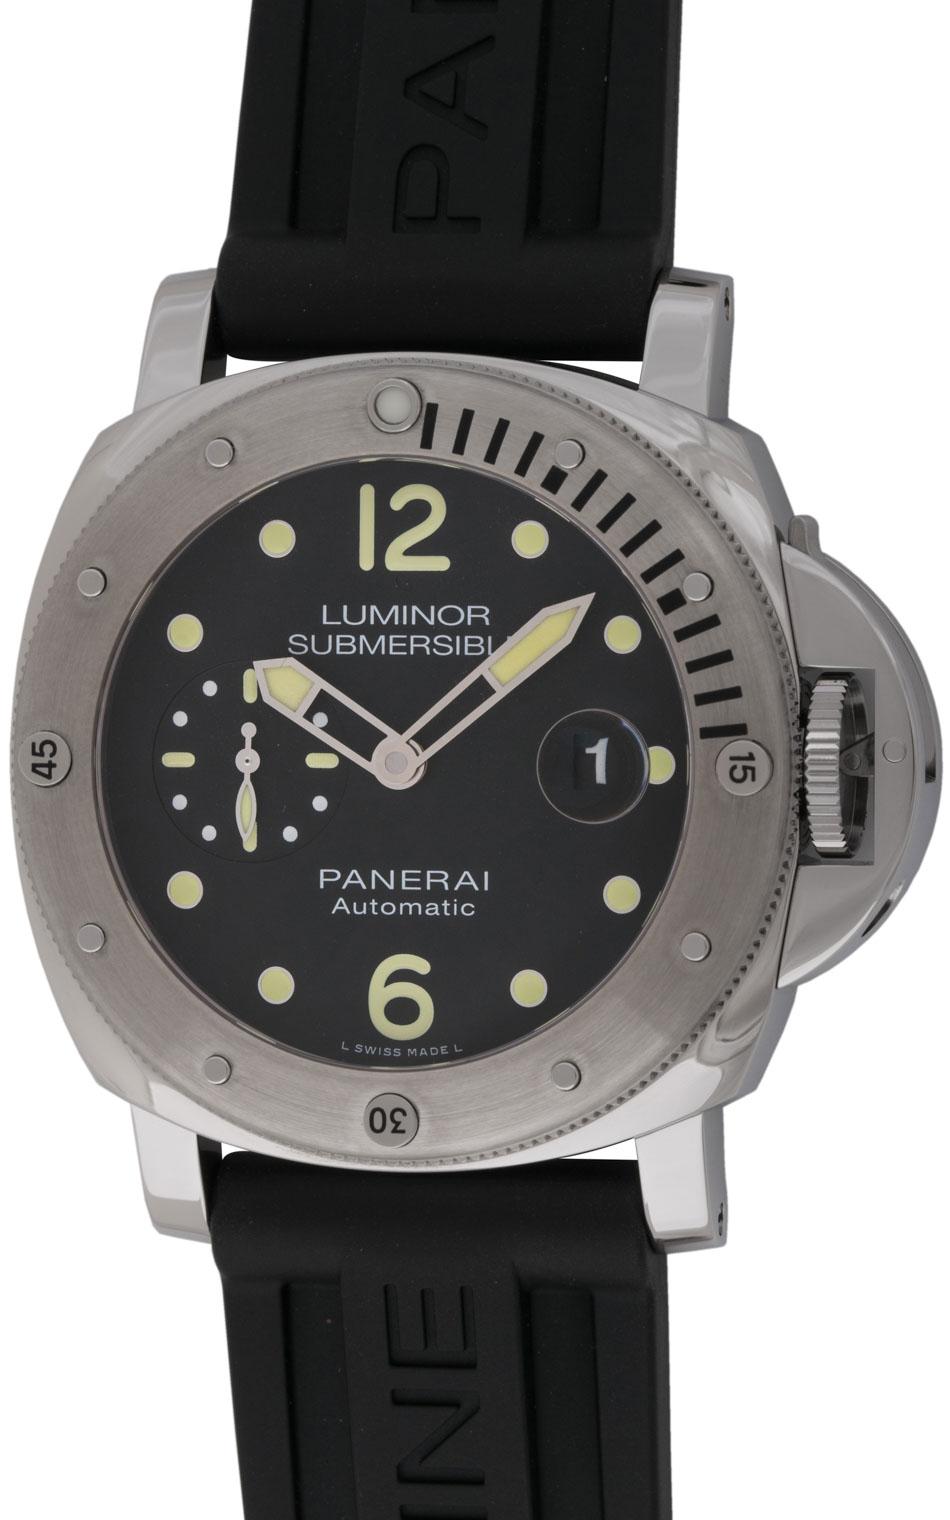 Panerai - Luminor Submersible